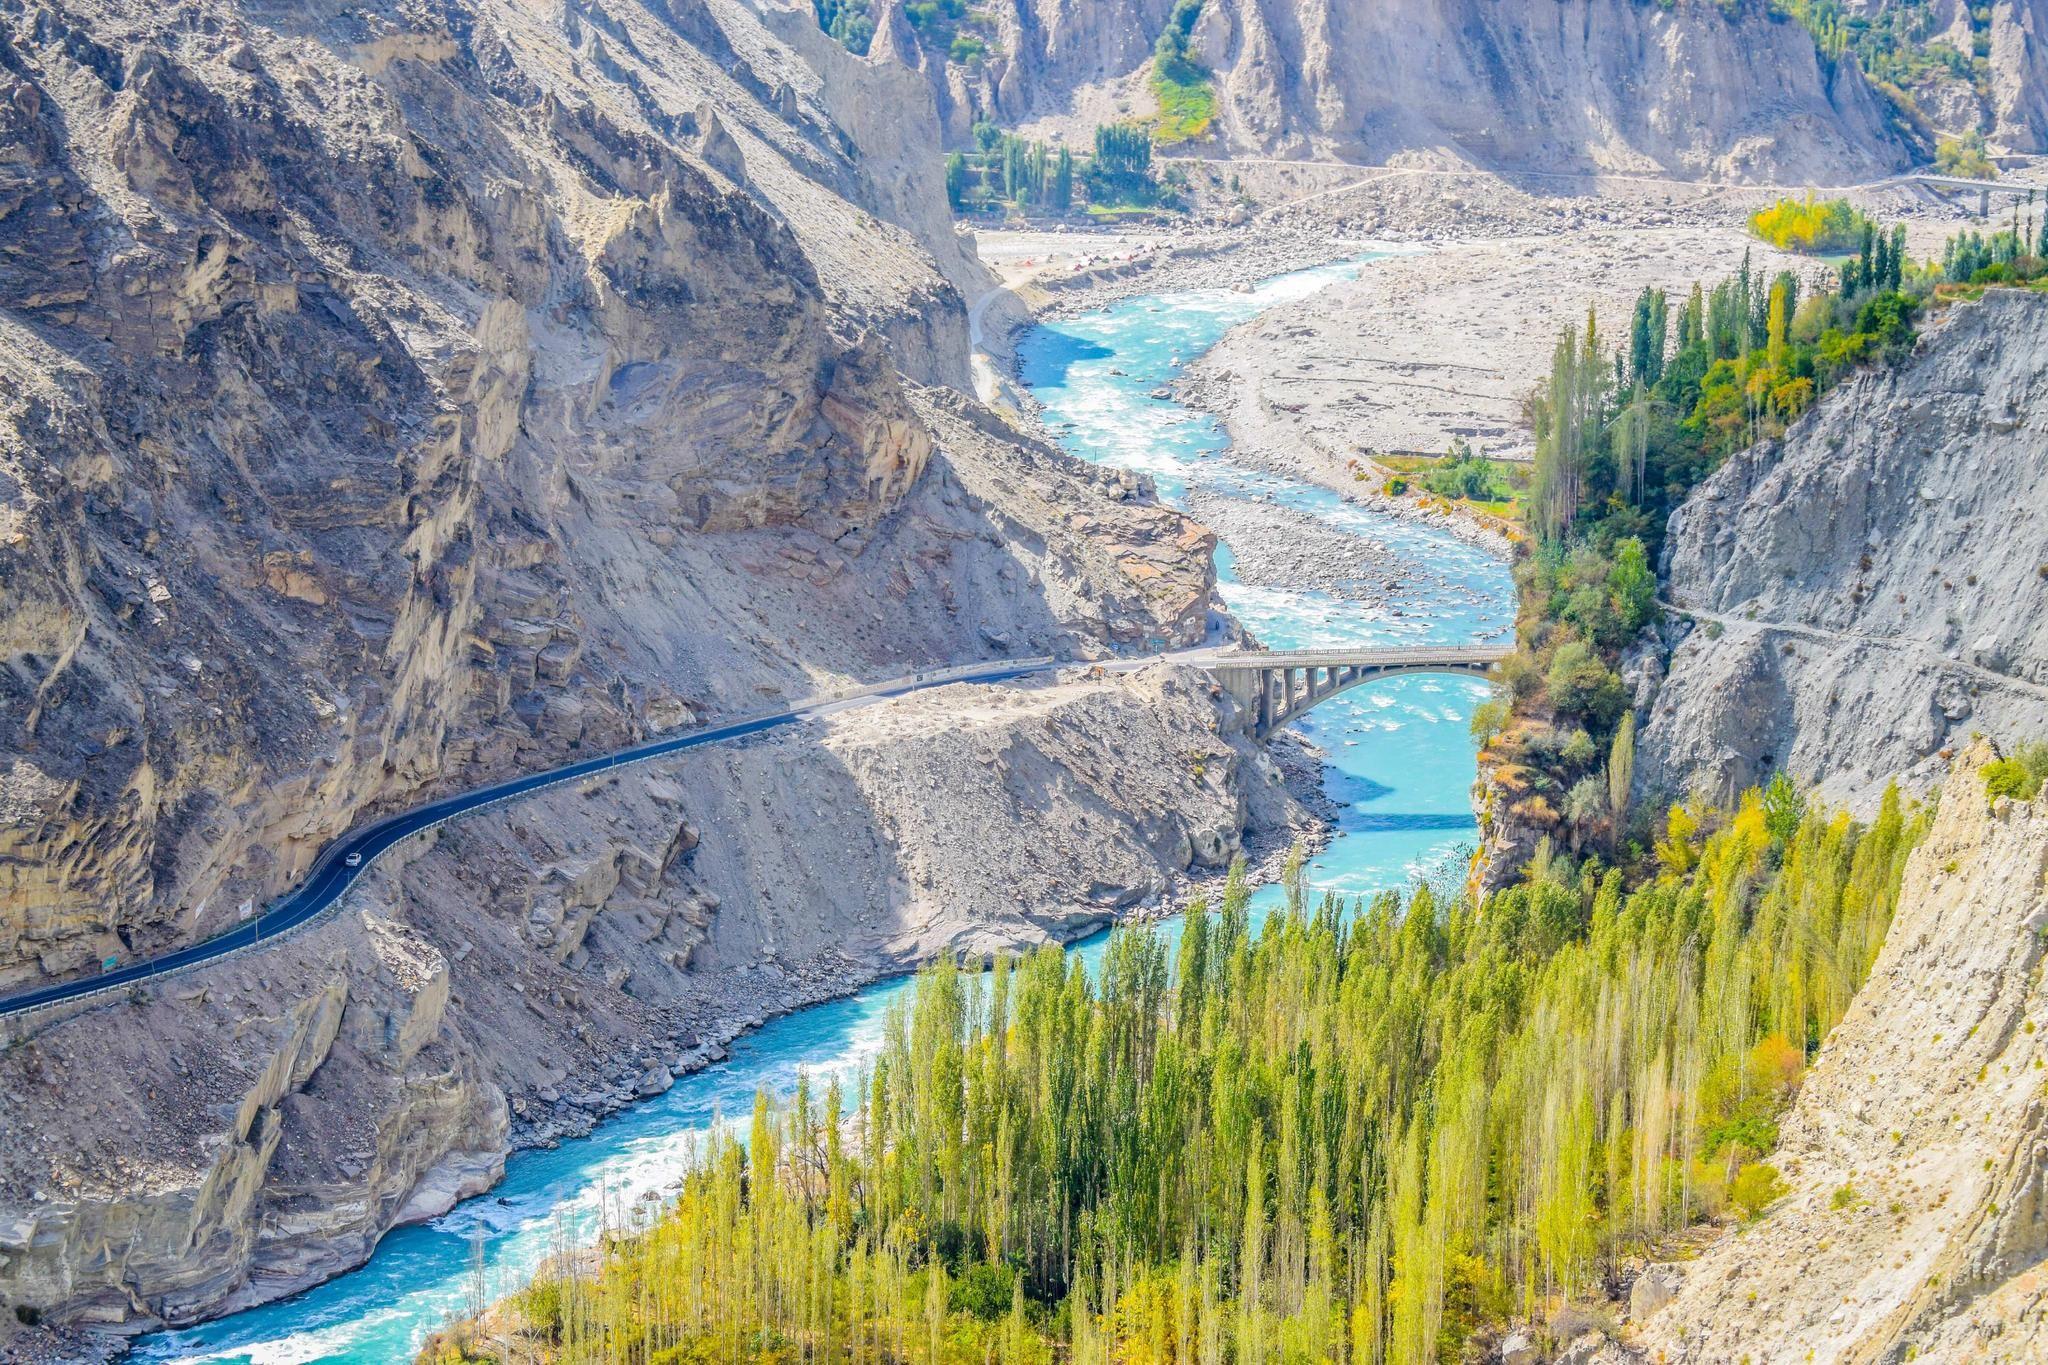 The Search - Pakistan